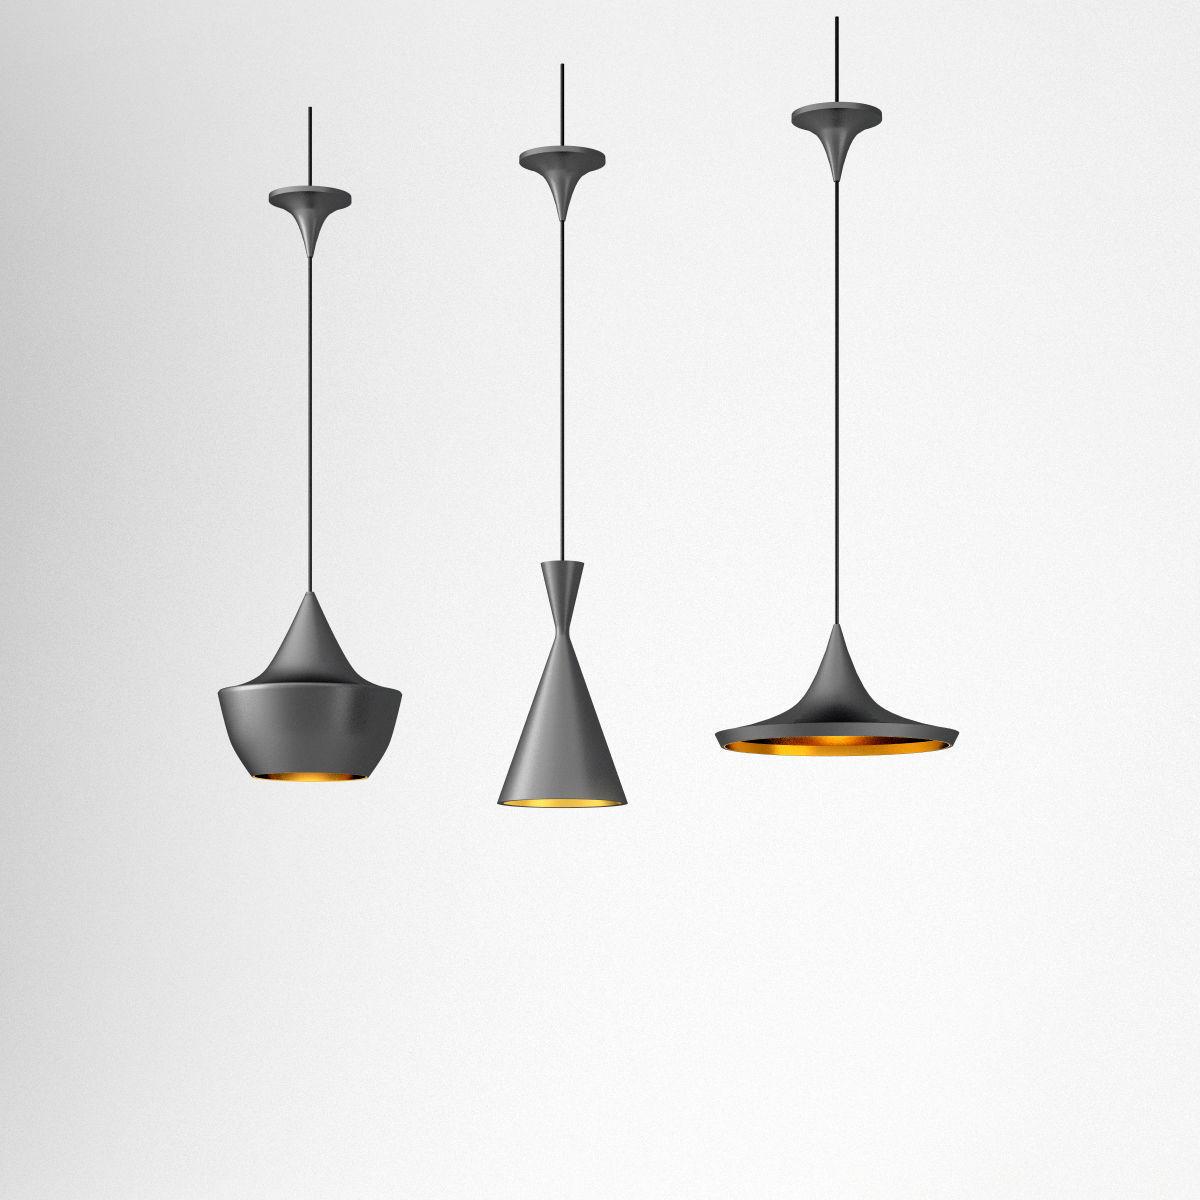 Tom Dixon Beat ceiling lamps